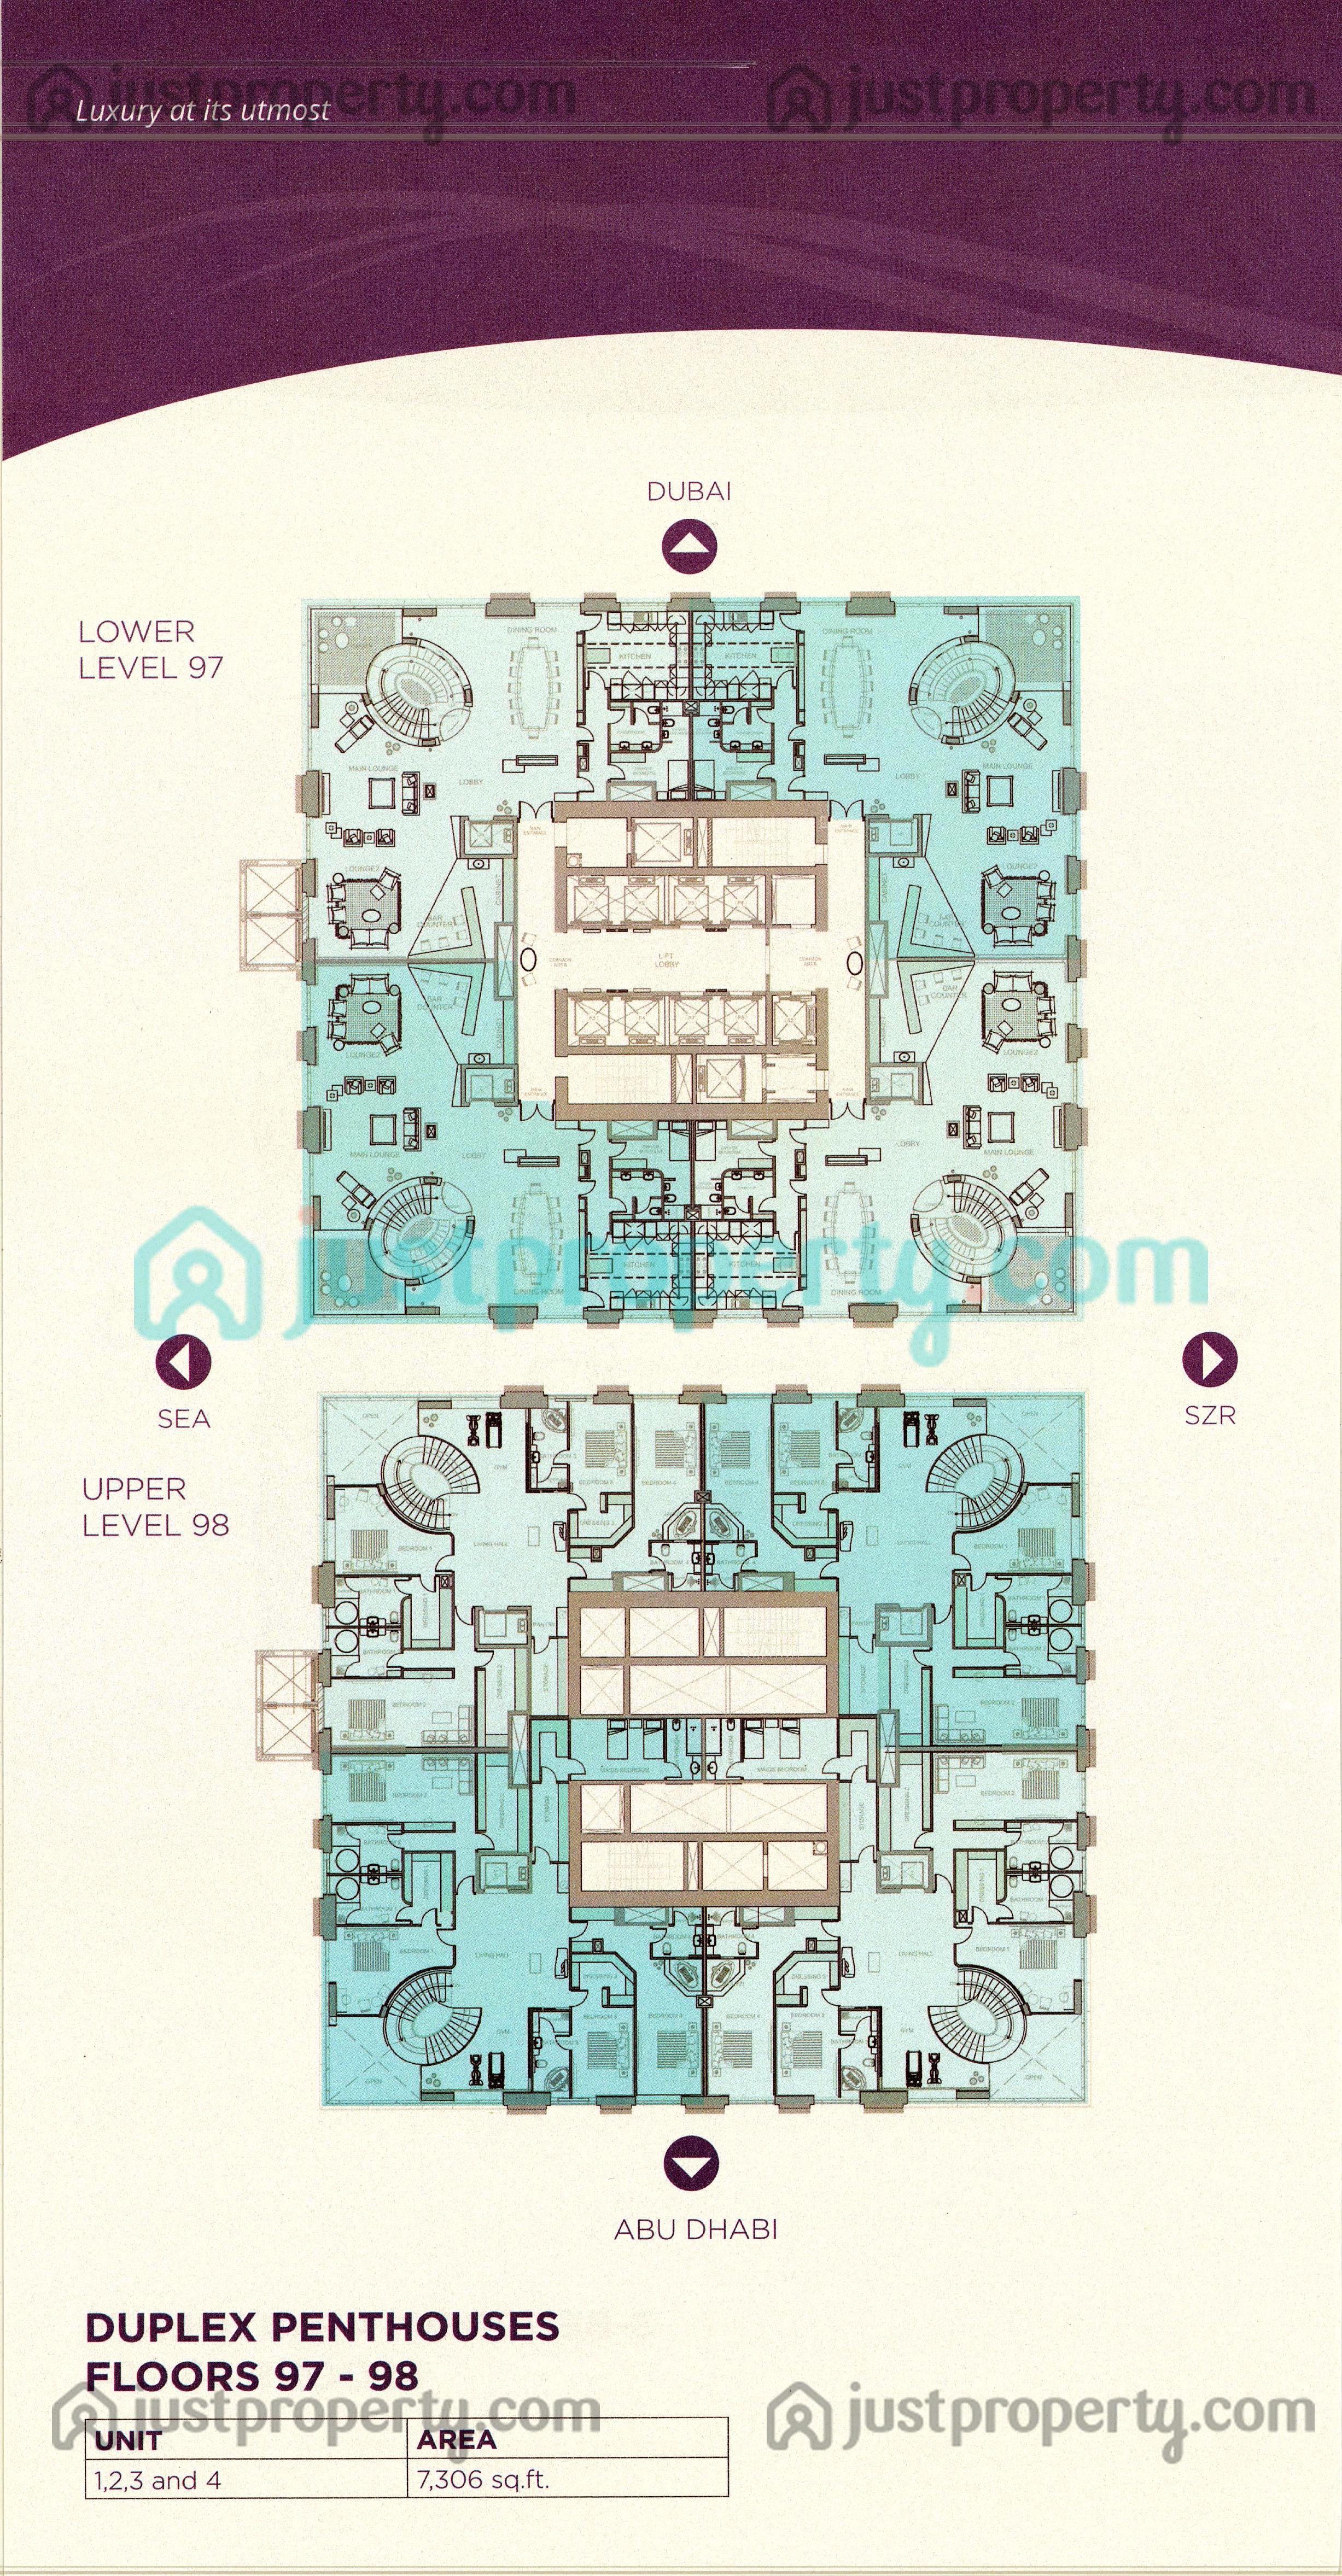 Floor Plans for Marina 101 (Dream Tower)